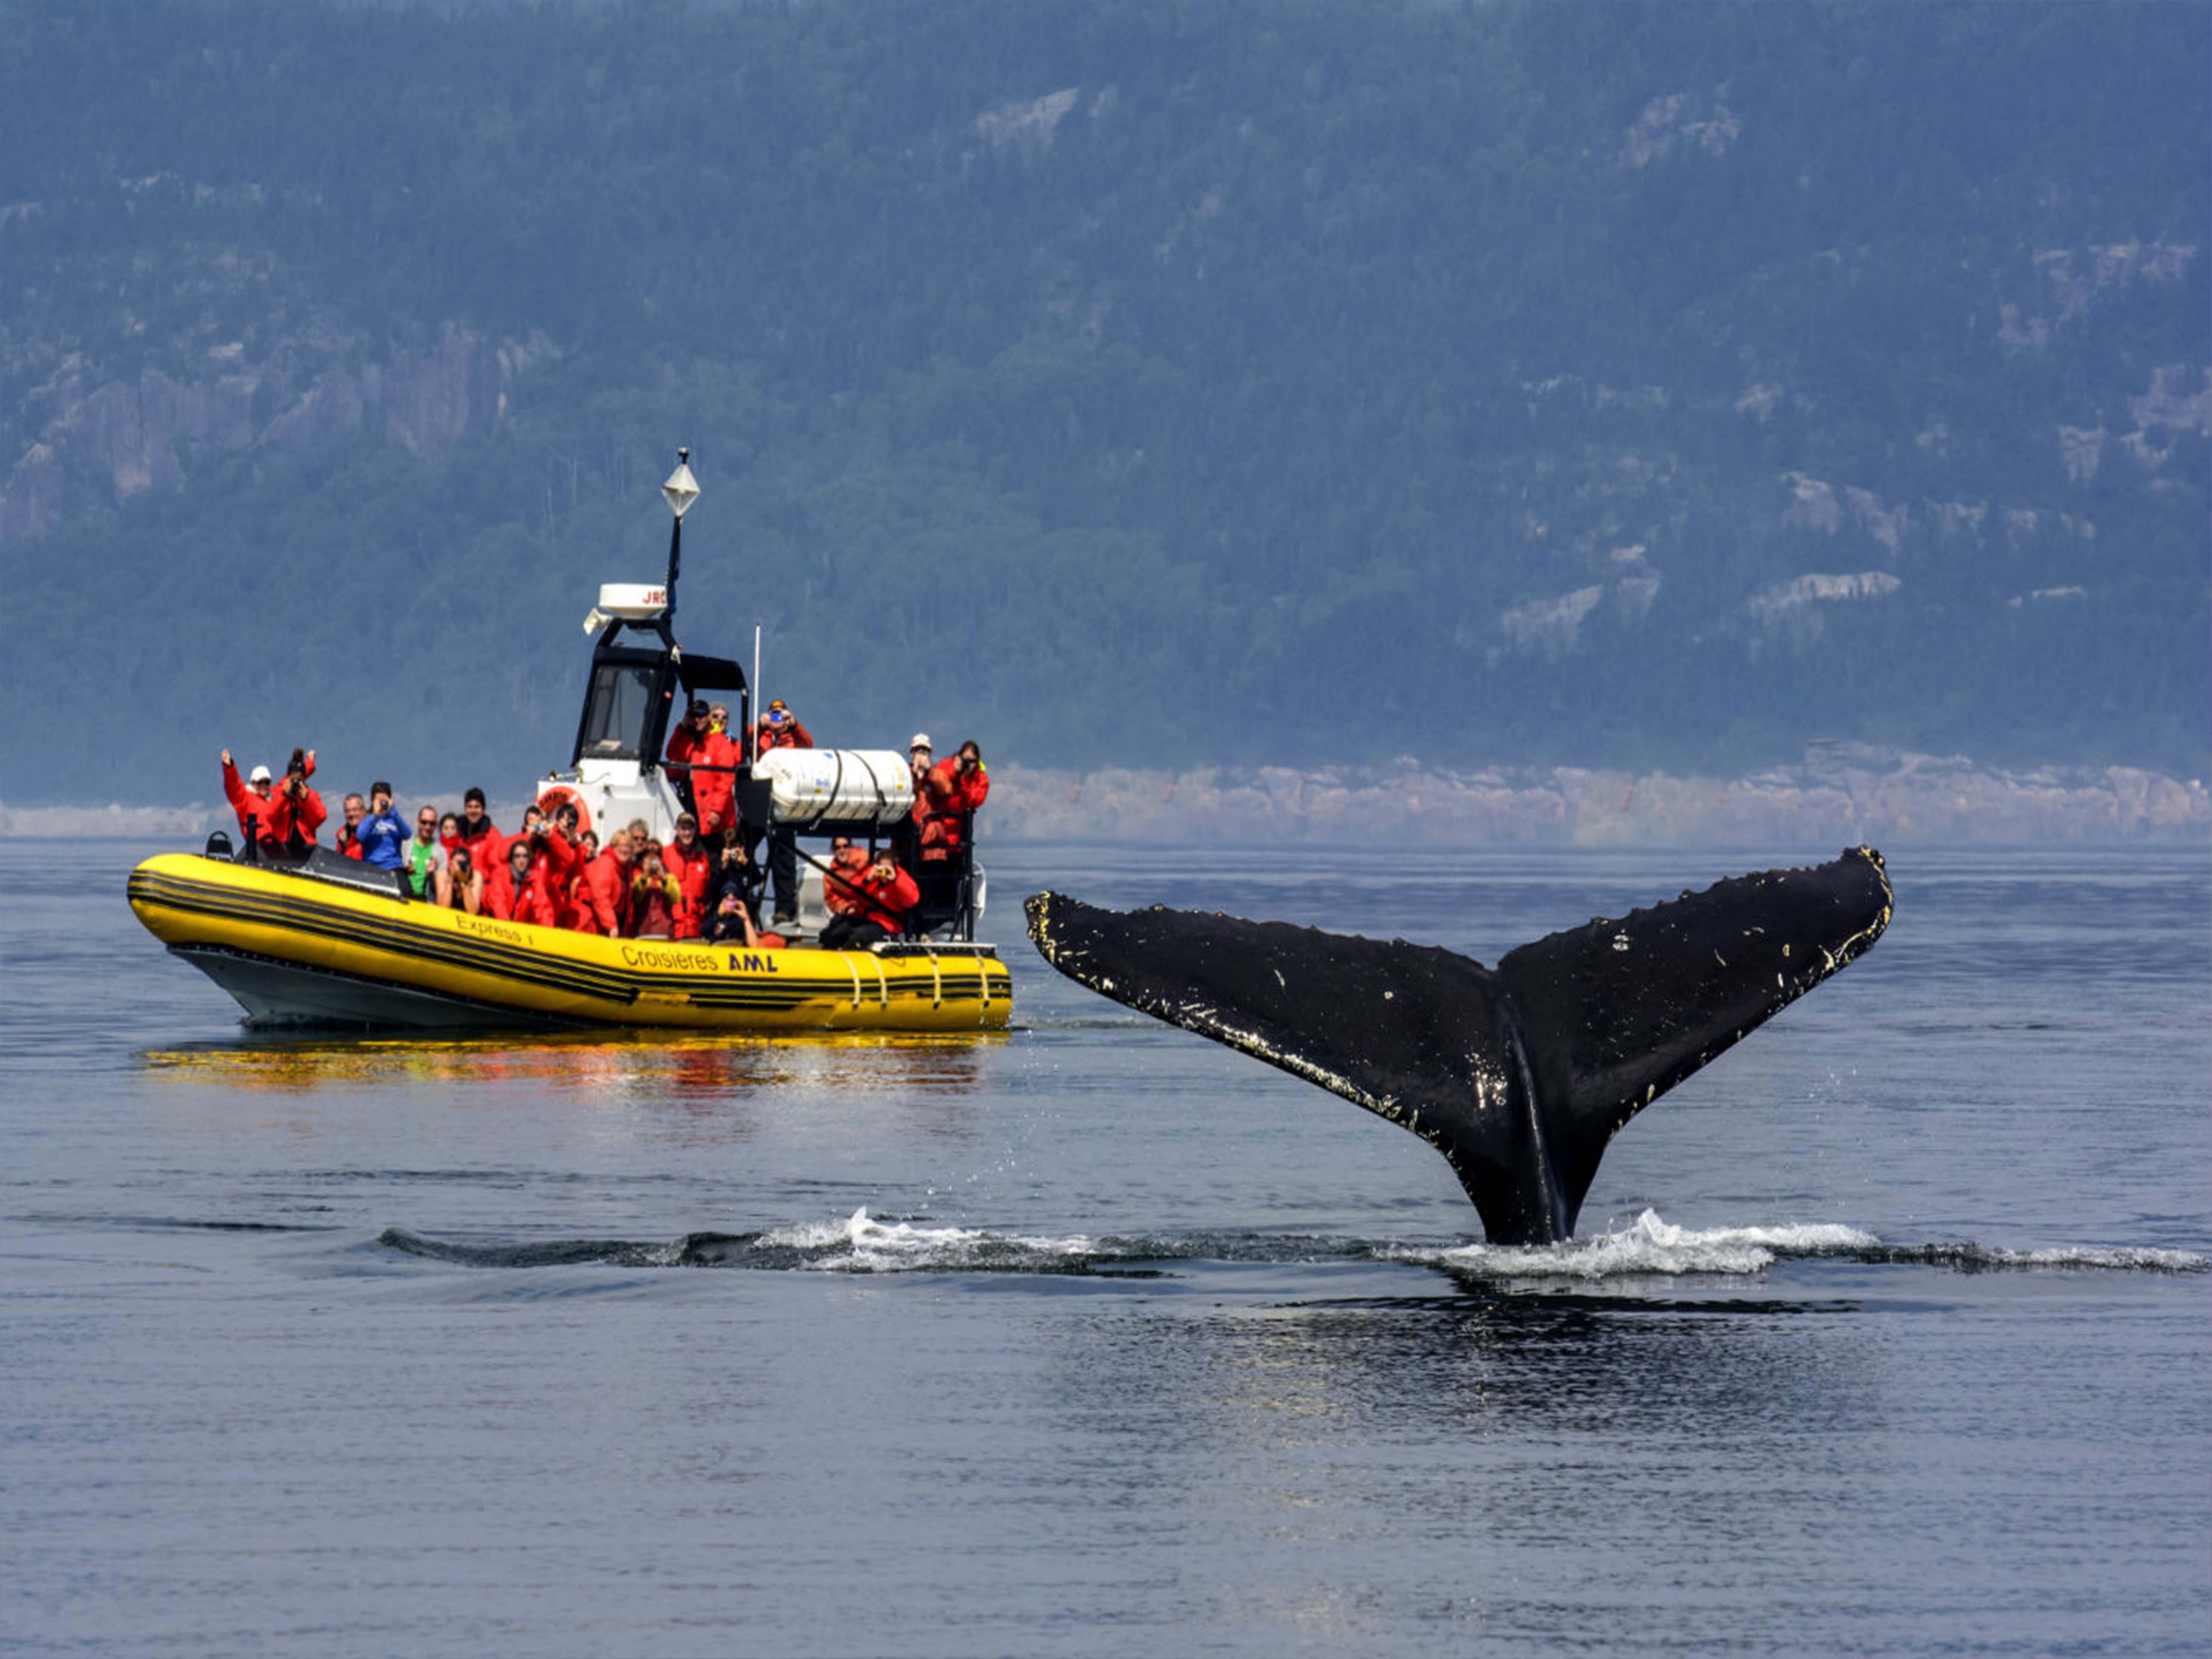 https://www.capauleste.com/wp-content/uploads/2016/02/Croisiere-baleines.jpg